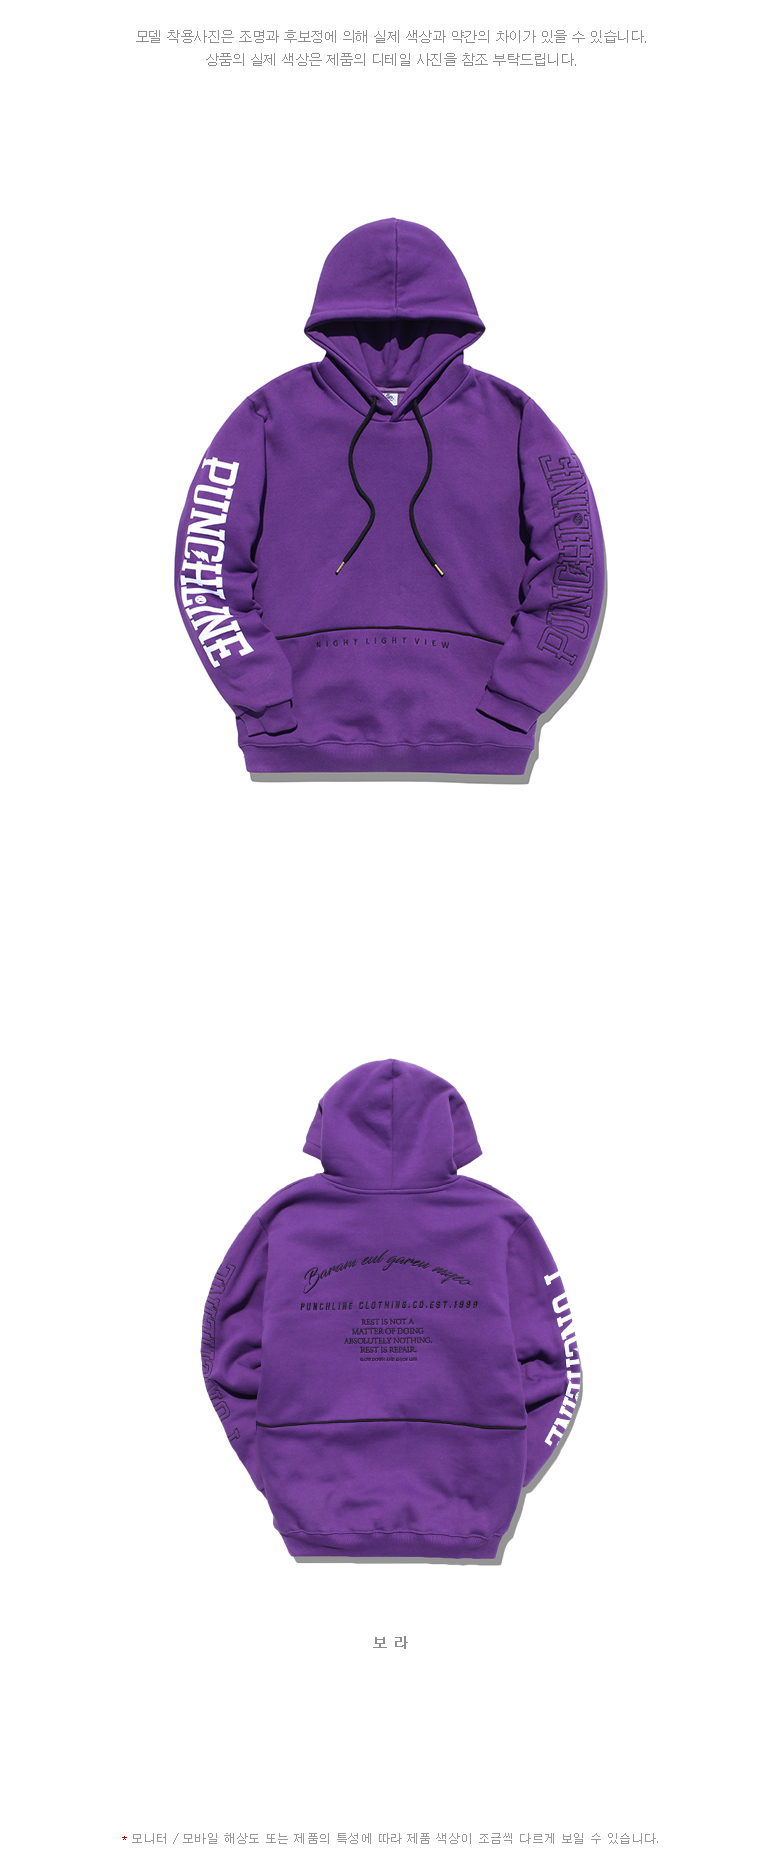 20180905_pl_KHHD6100_detail_purple_01.jpg